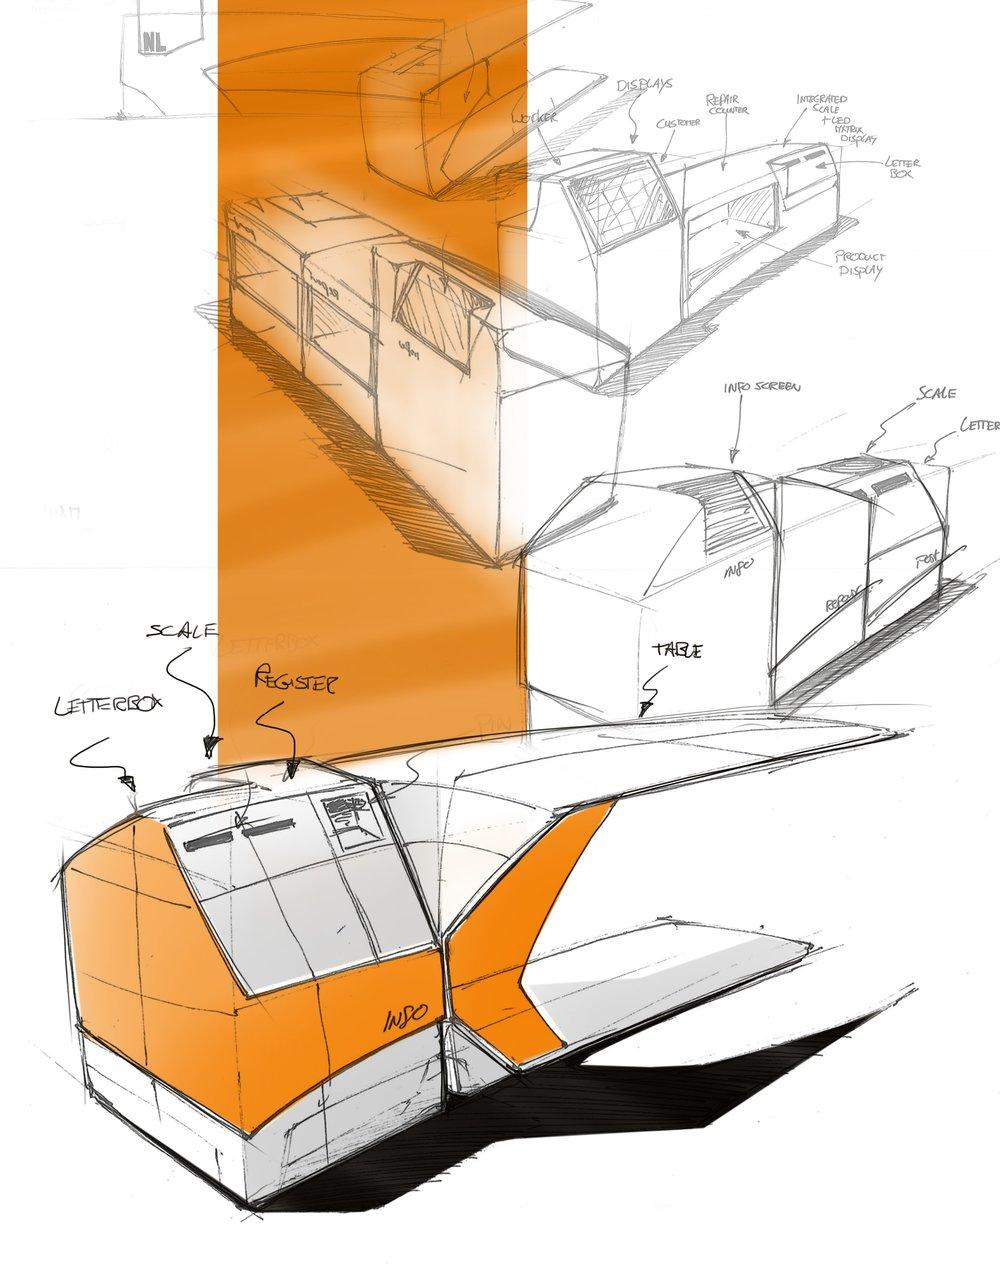 Shop-desk with postal services